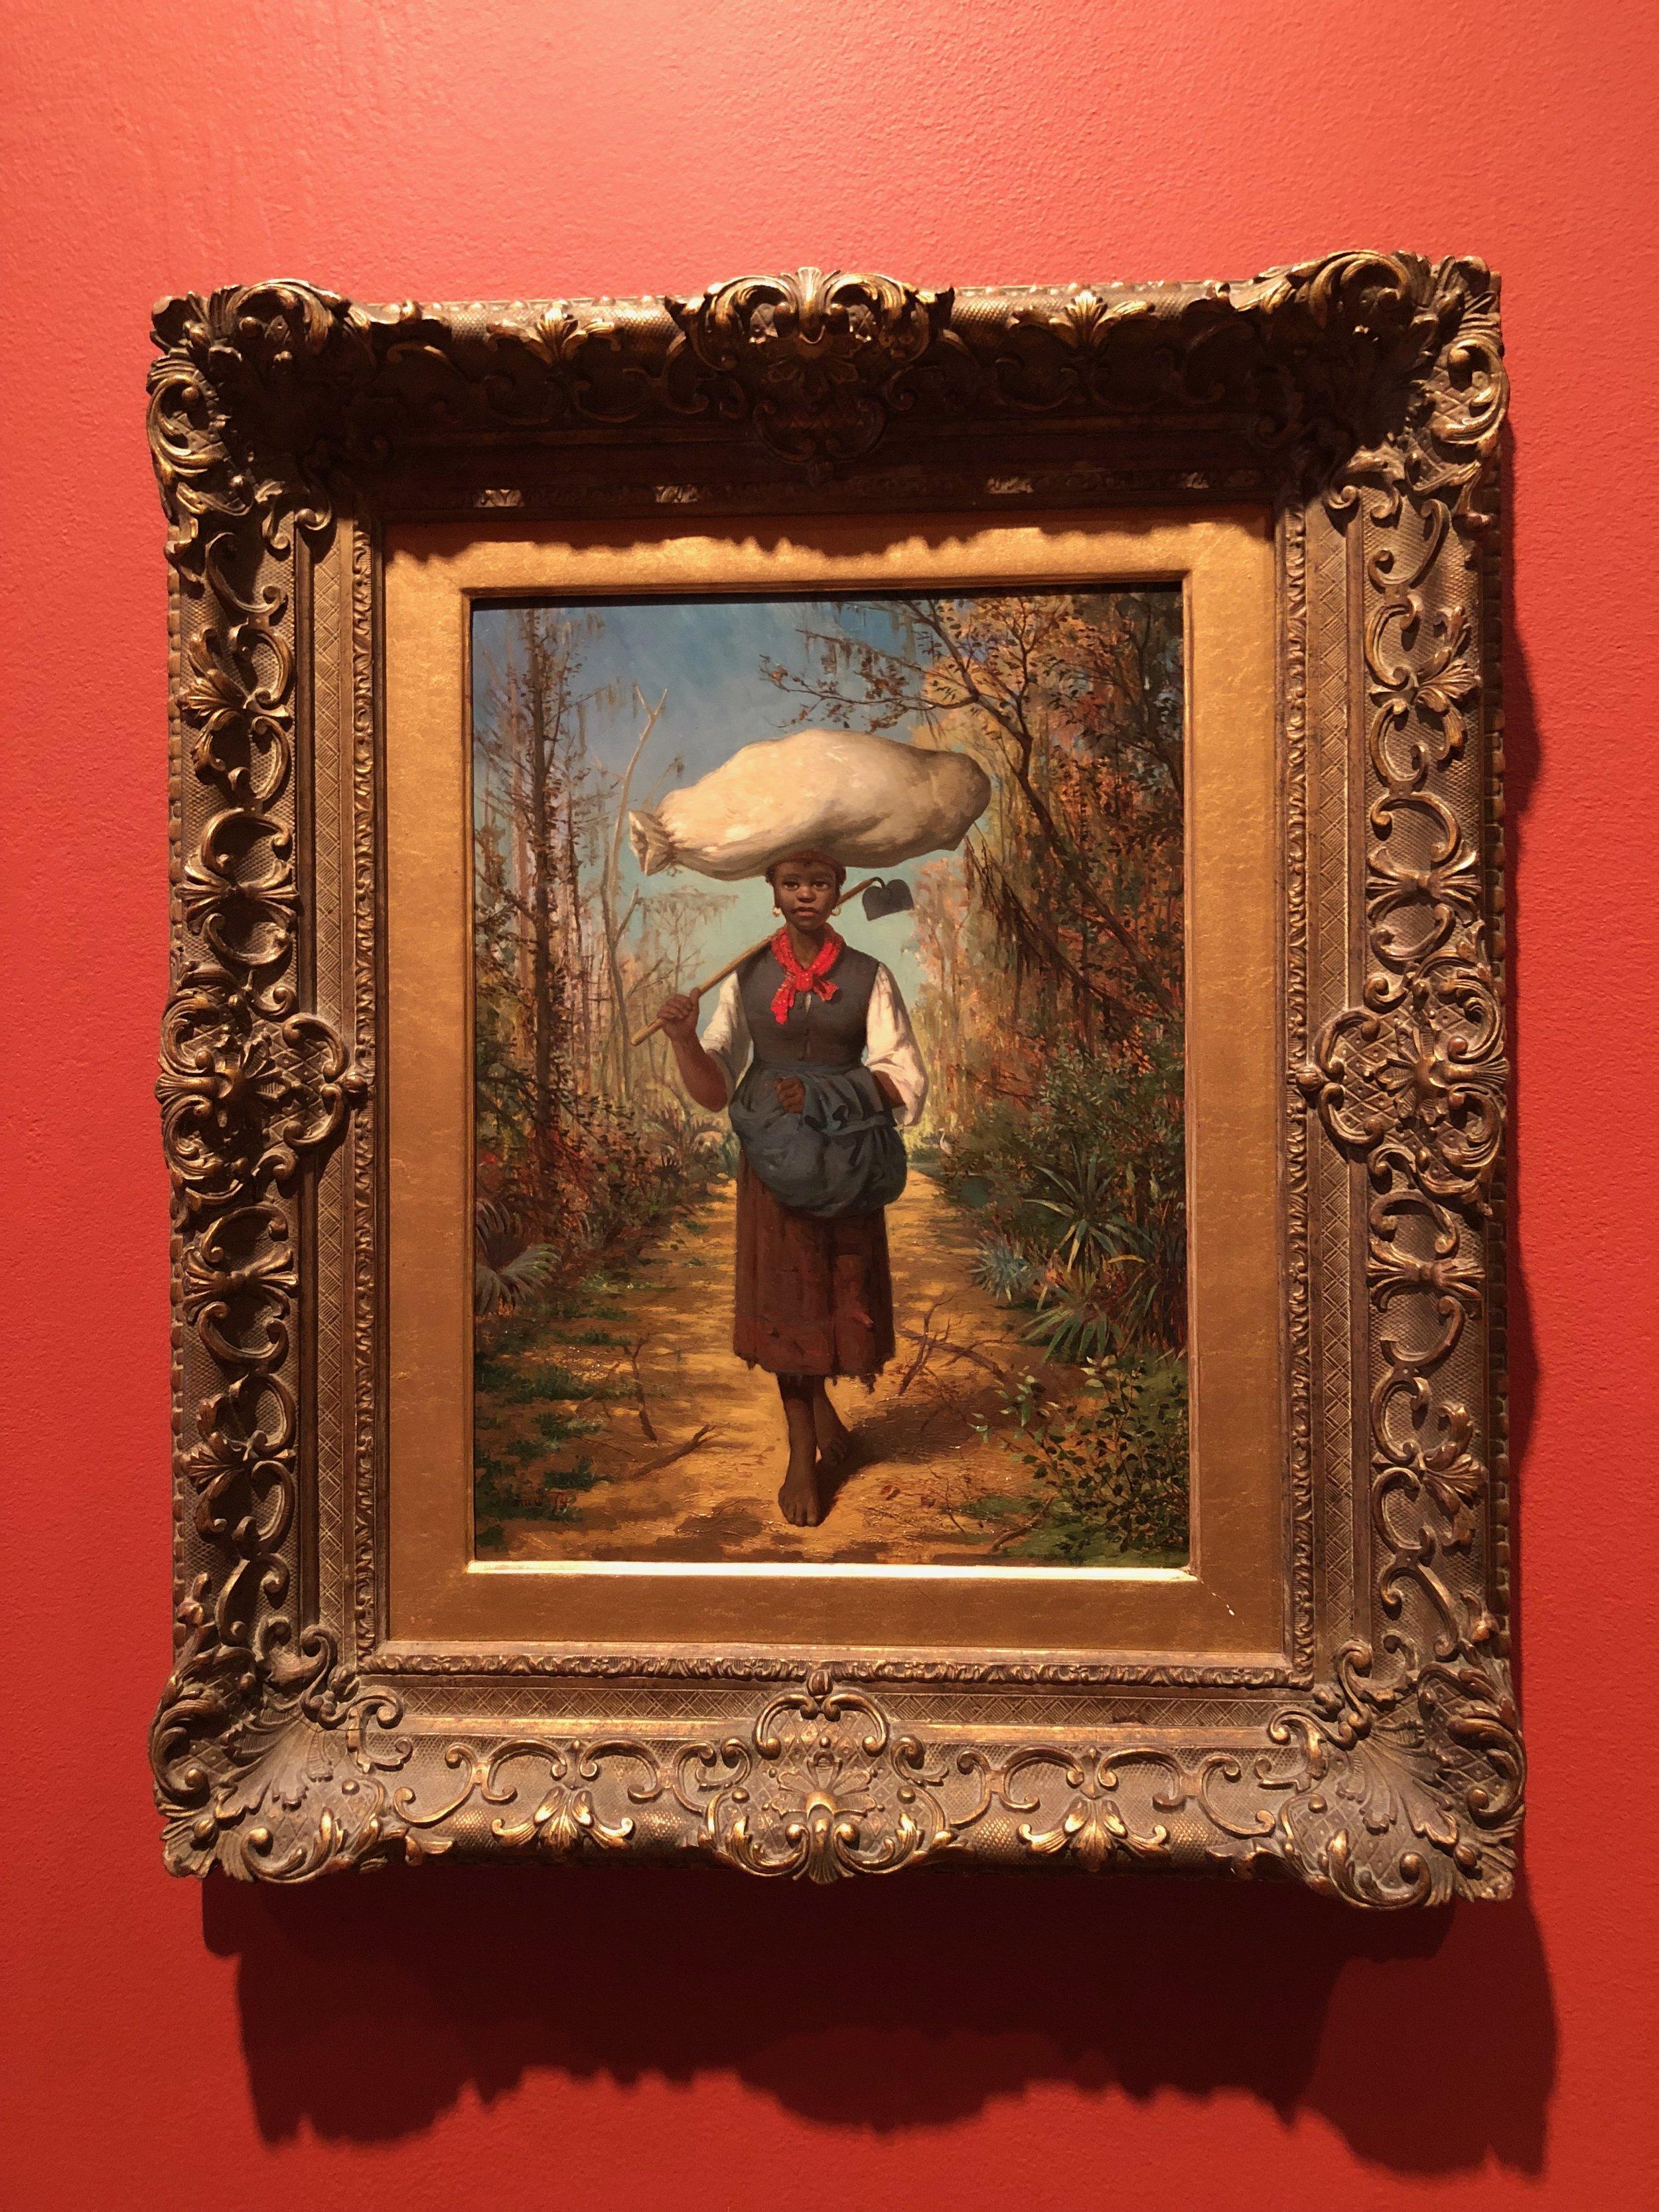 Return from Harvesting,  1874 - James Wells Champney